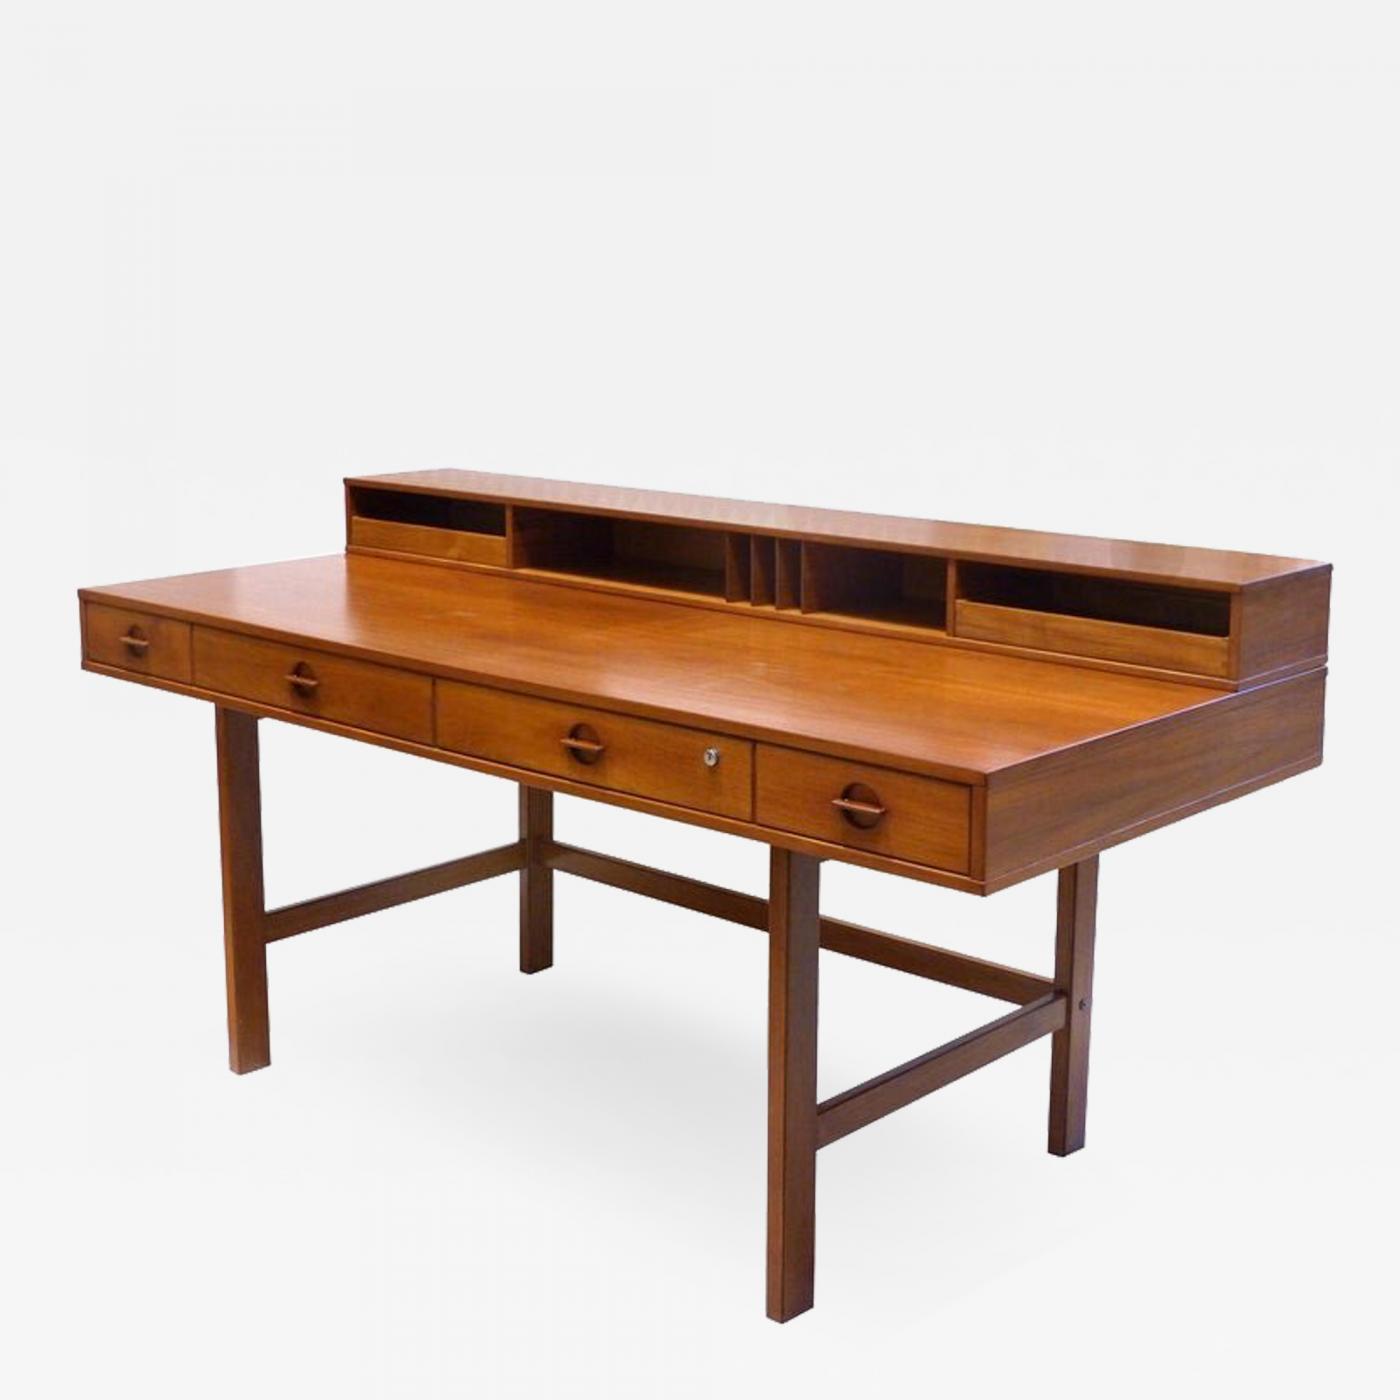 Image of: Jens Quistgaard Danish Modern Flip Top Teak Desk By Jens Quistgaard For Peter Lovig Nielsen